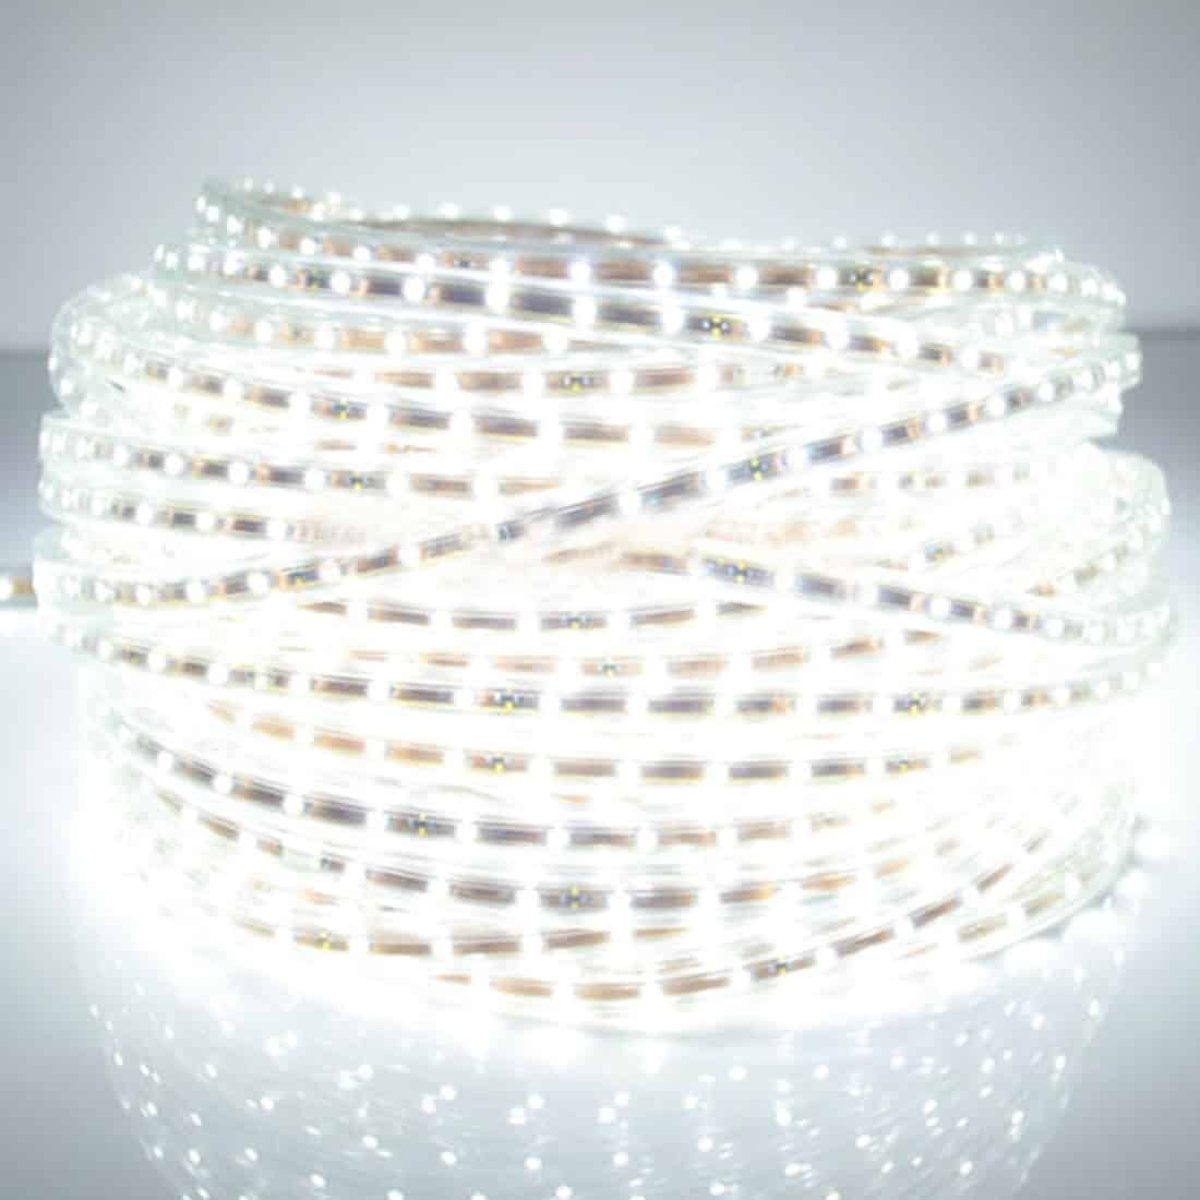 Behuizing Waterdichte LED-lichtstrook, Lengte: 5 m, Waterdichte IP65 SMD 5730 LED-lamp met stekker, 120 LED / m, AC 220V (wit licht) kopen